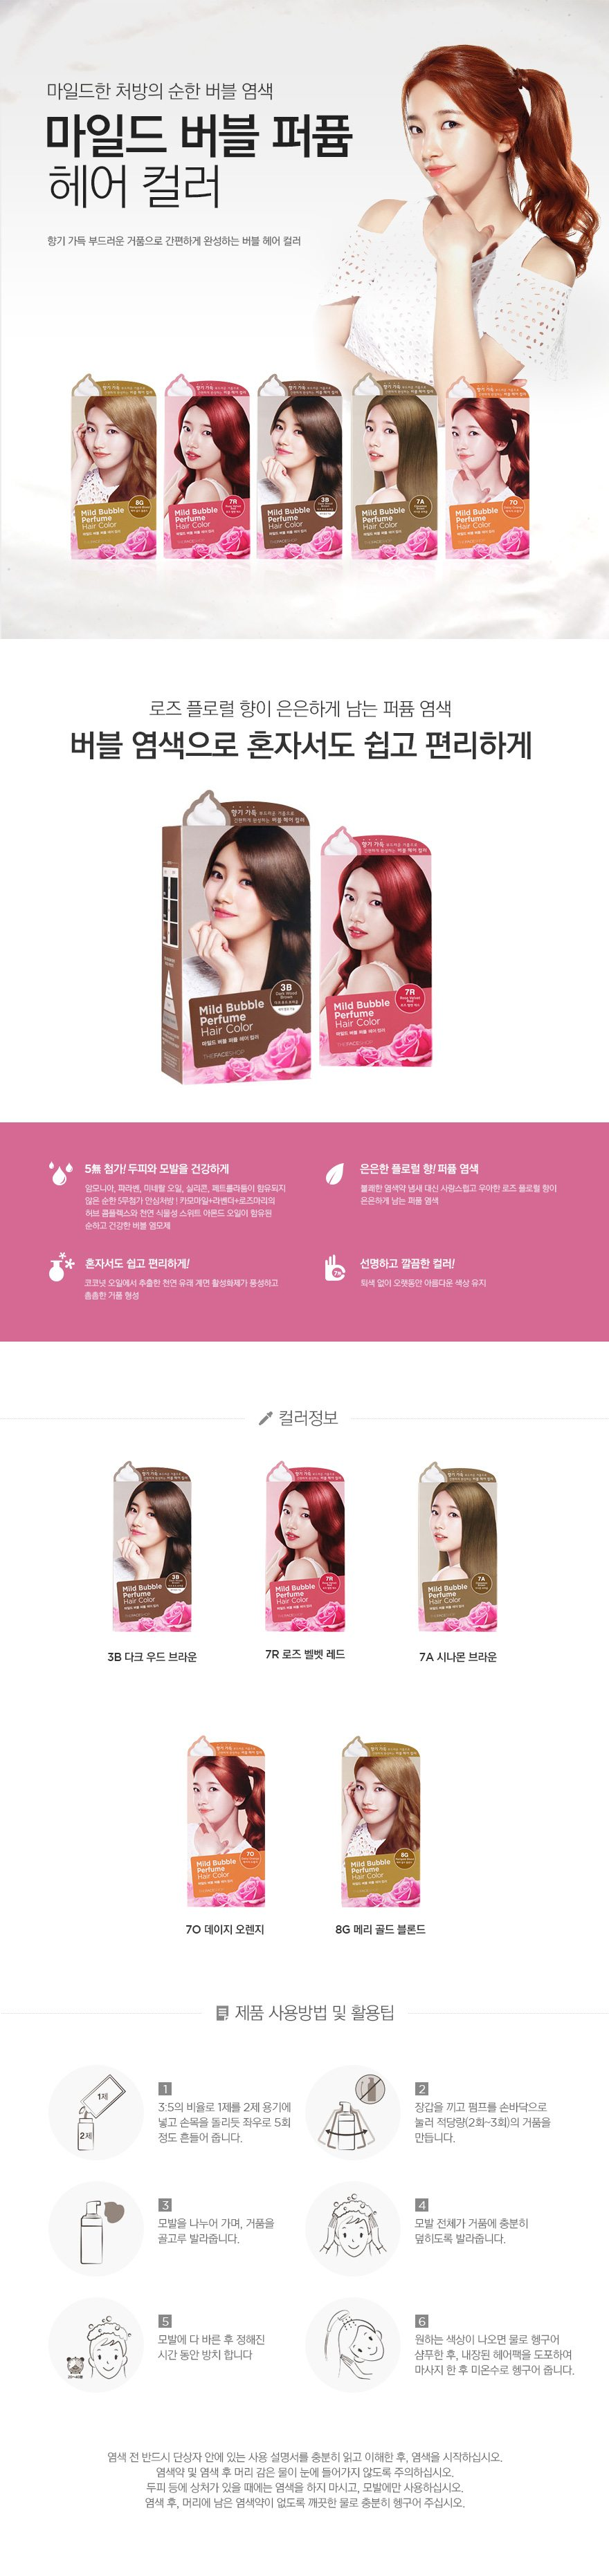 The Face Shop Mild Bubble Perfume Hair Color Seoul Next By You